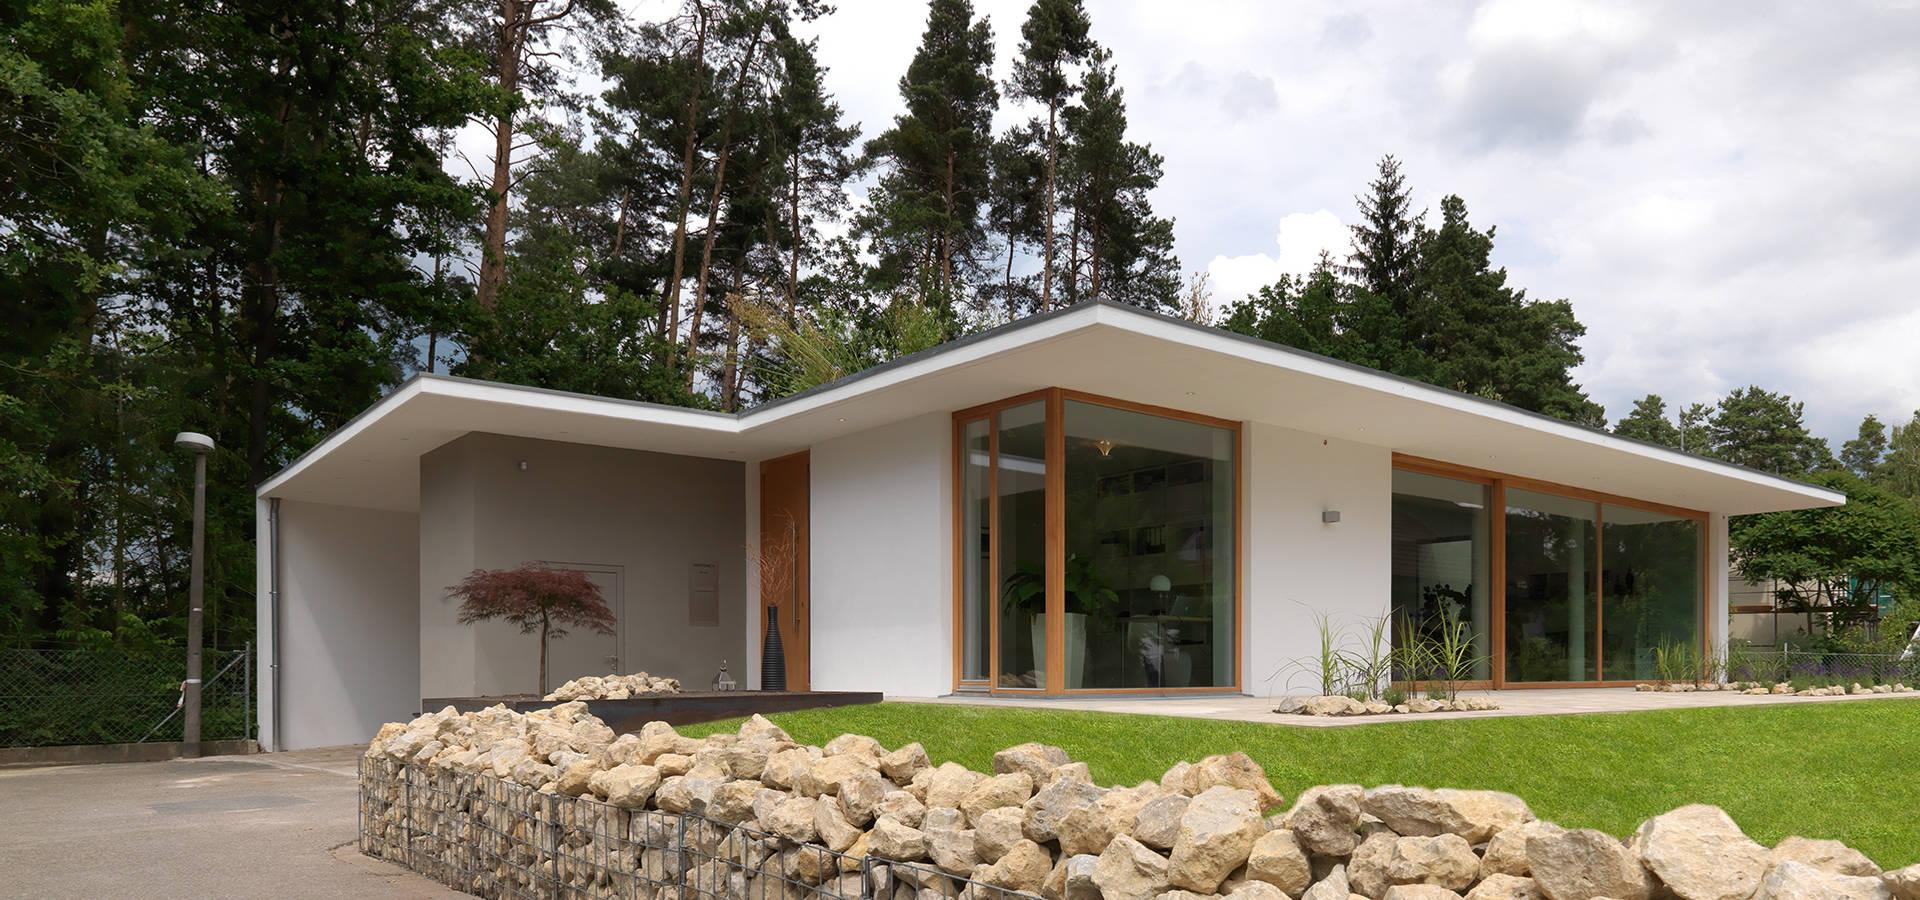 bungalow am hang profesjonalista berm ller hauner architekturwerkstatt homify. Black Bedroom Furniture Sets. Home Design Ideas